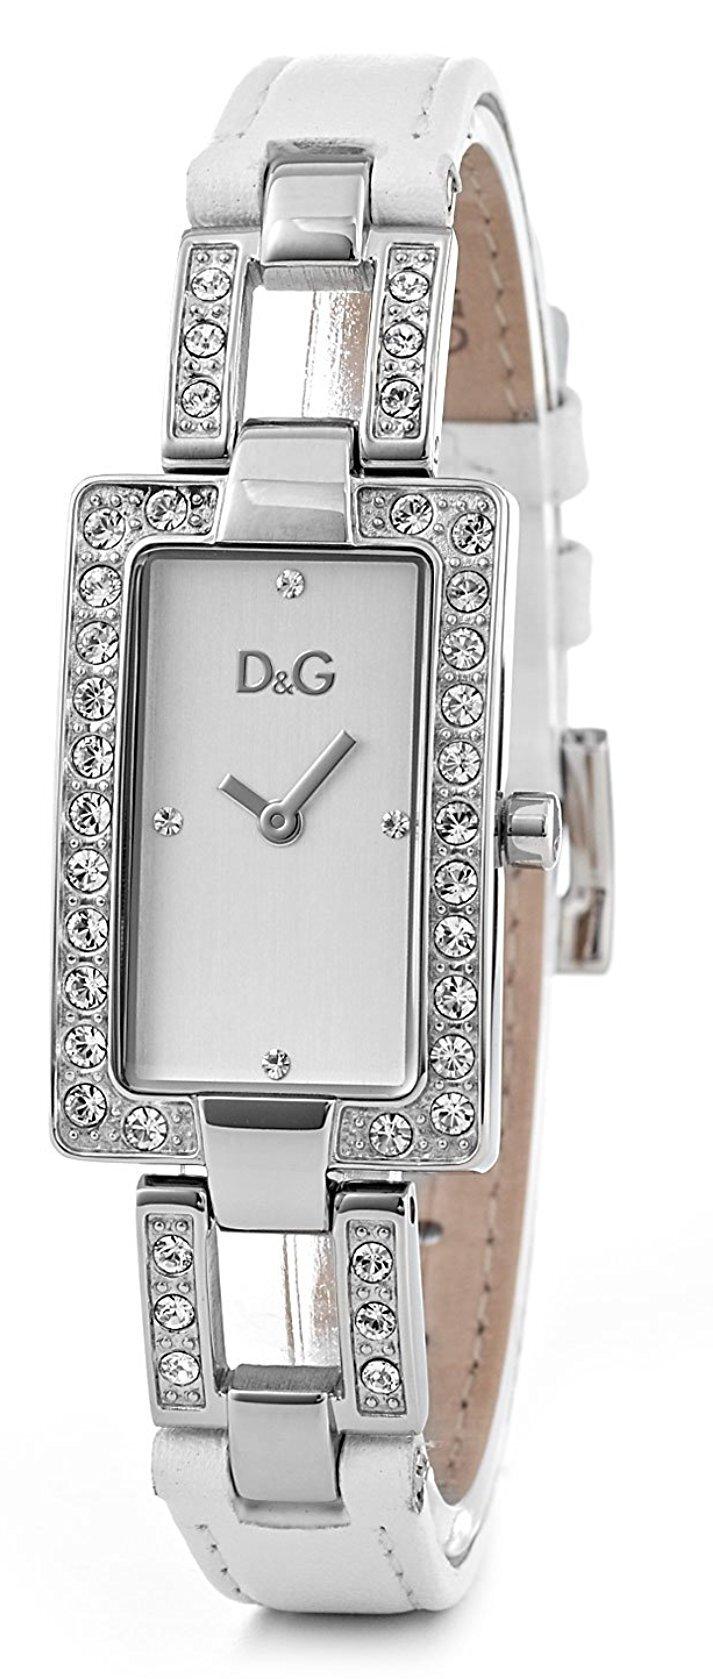 Dolce & Gabbana D&G Chamonix Damklocka DW0558 Silverfärgad/Läder - Dolce & Gabbana D&G